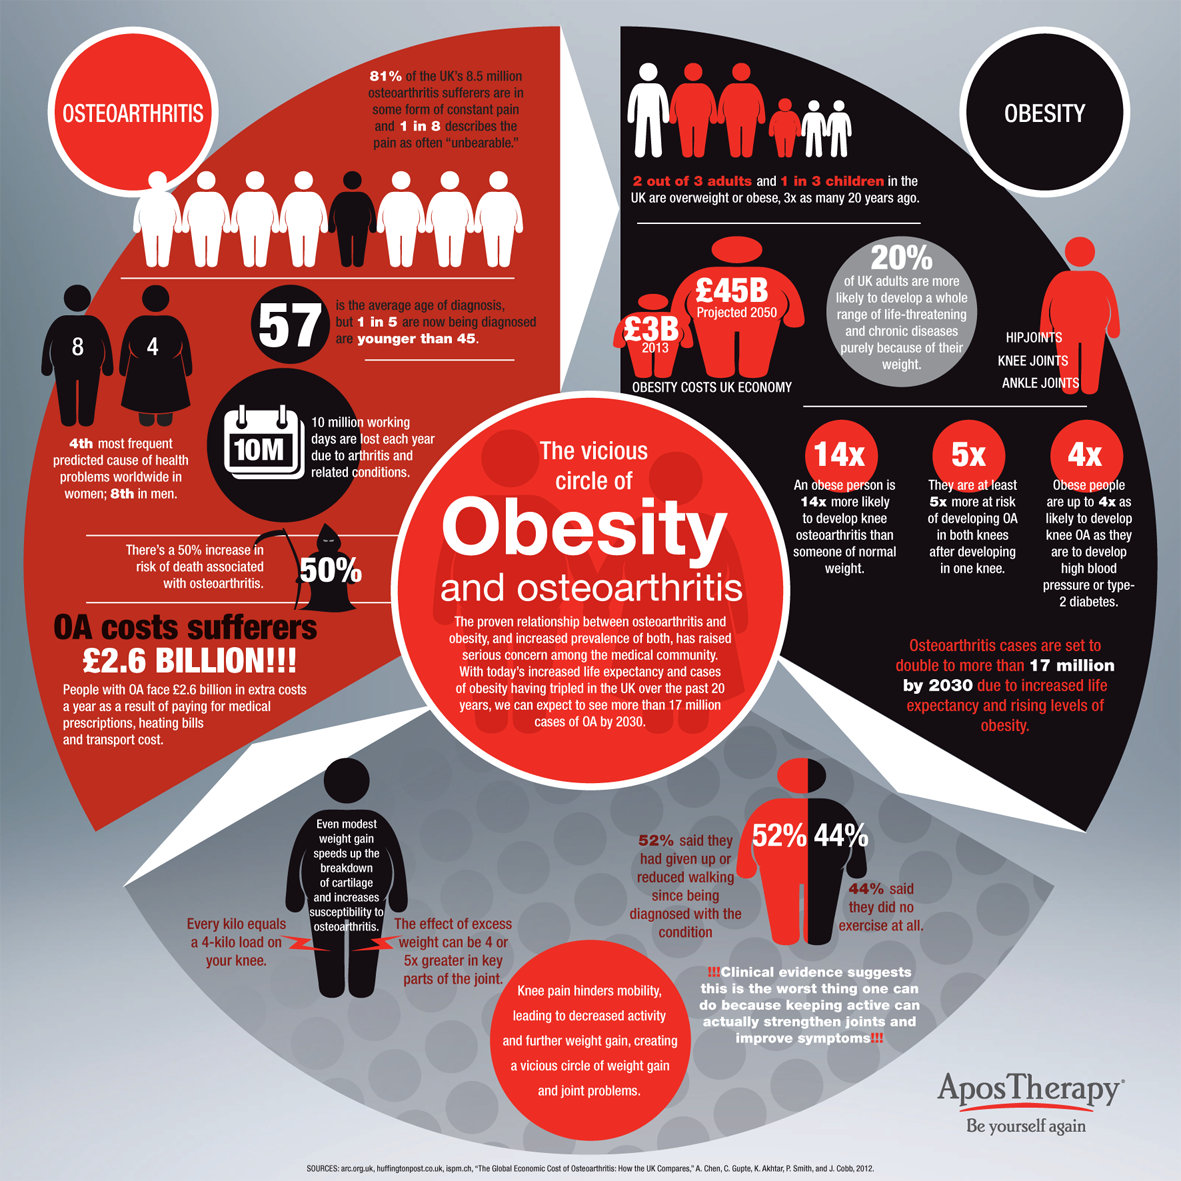 Obesity and Osteoarthritis by HUG Osteoarthritis